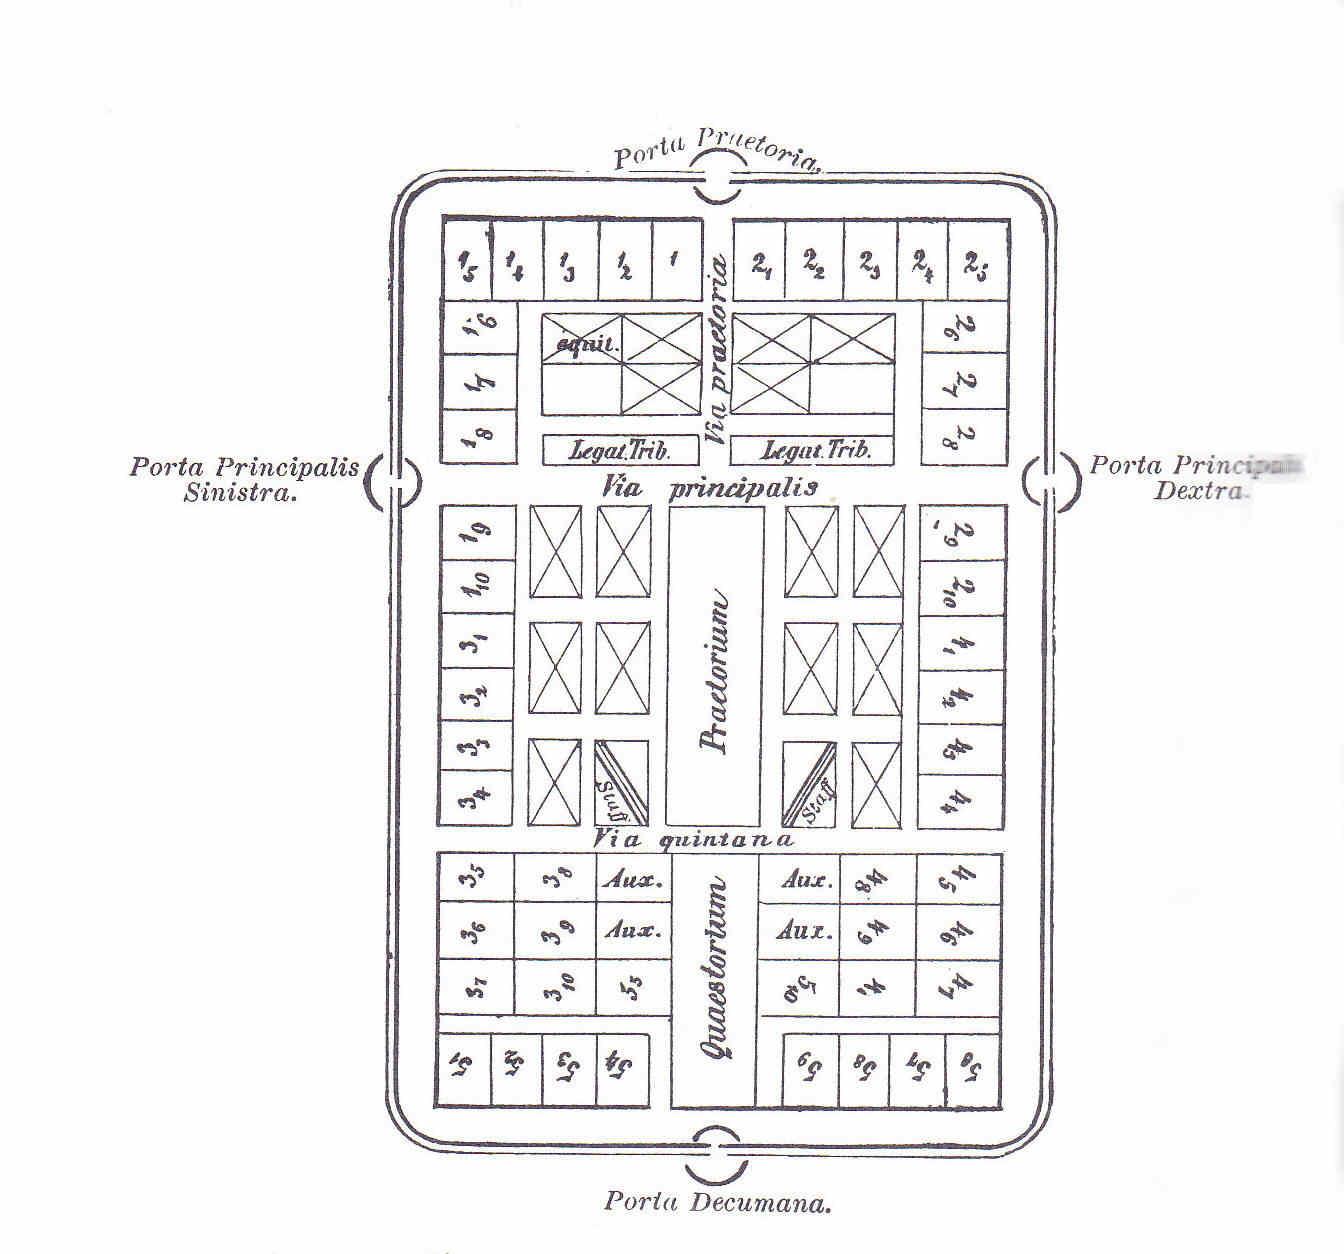 Egipto Antiguo 127 Problemas de Julio César escaso de tropas